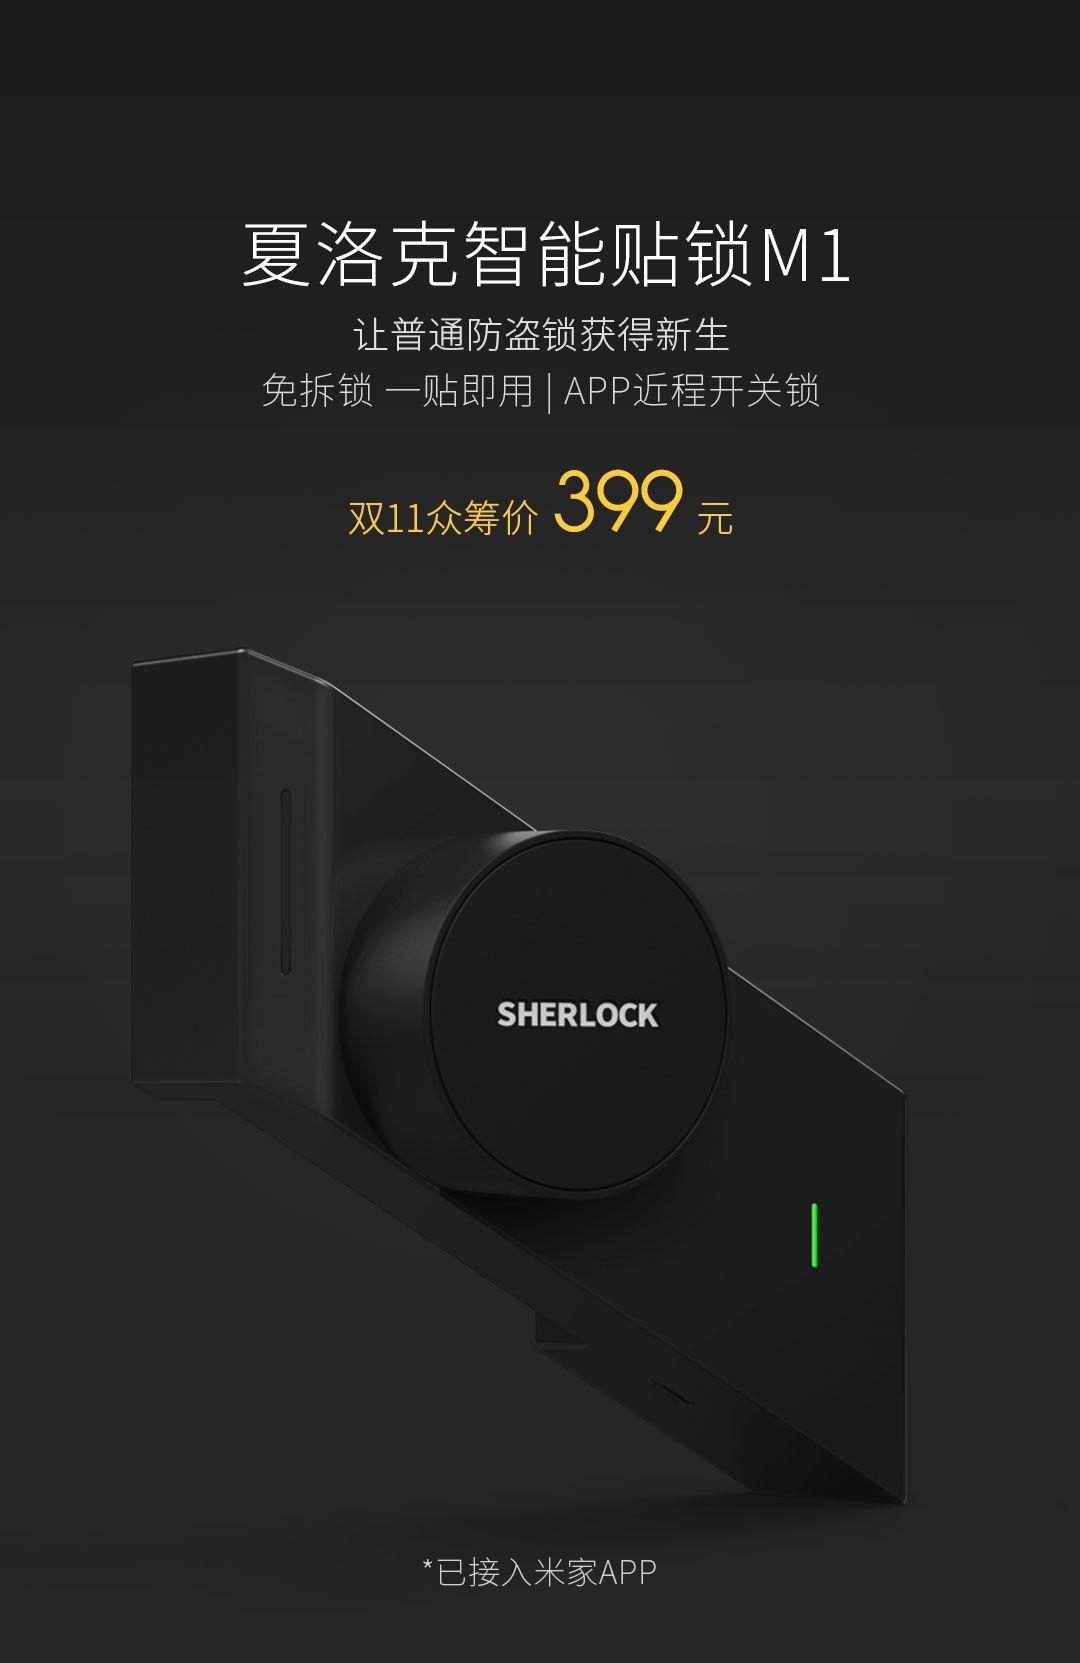 Xiaomi presenta Sherlock, para la seguridad de tu vivienda. - Xiaomi4Mi